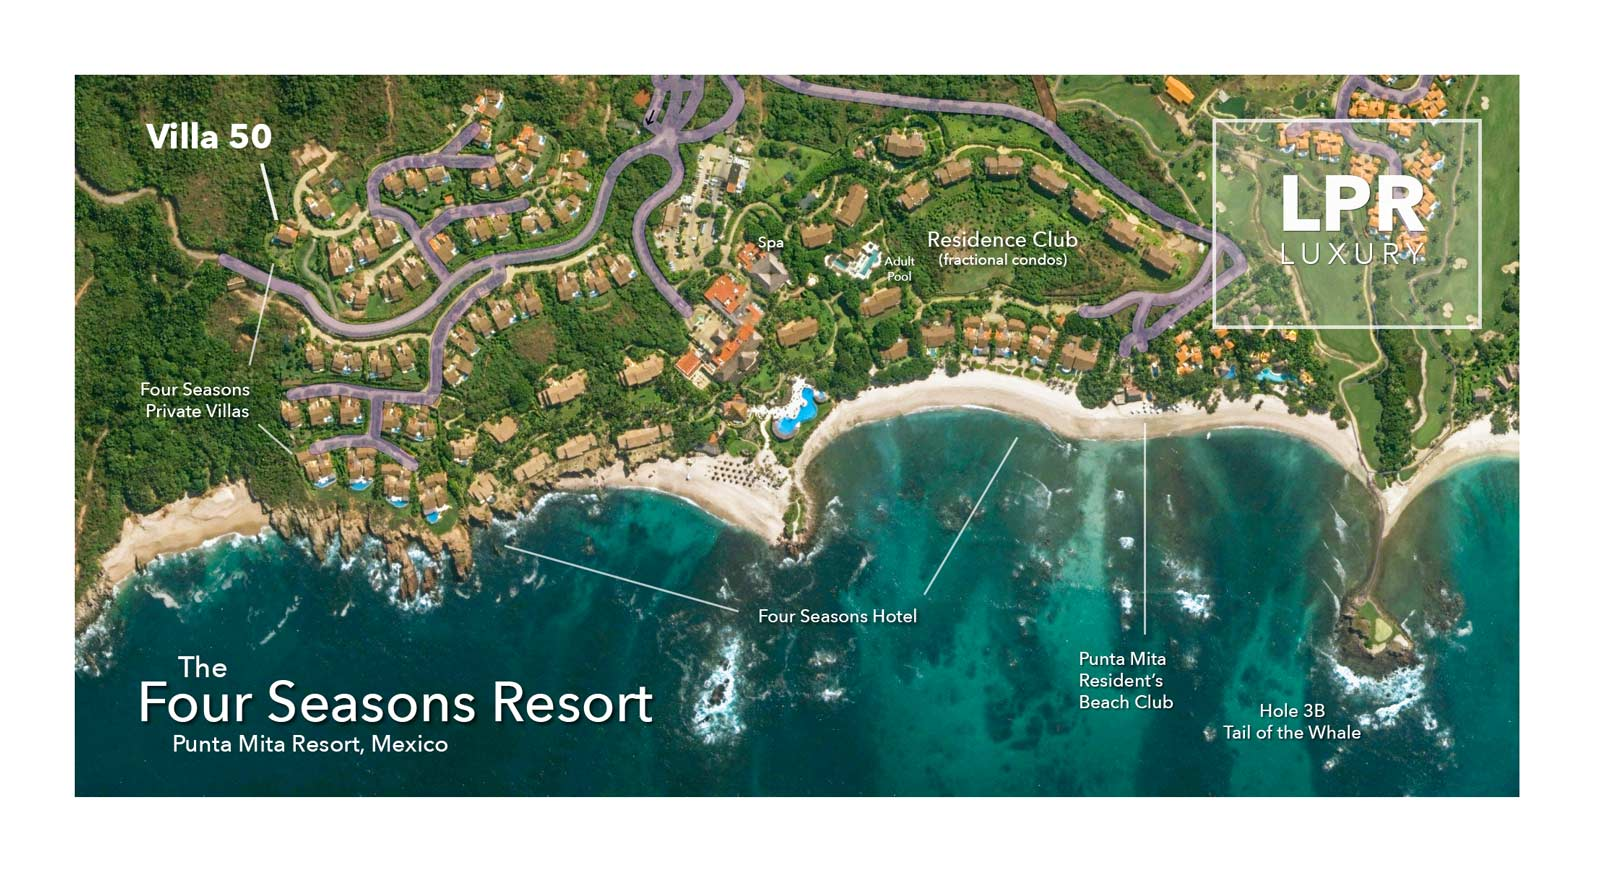 Four Seasons Private Villa 50 - Luxury Punta Mita real estate and vacation rentals - Mexico